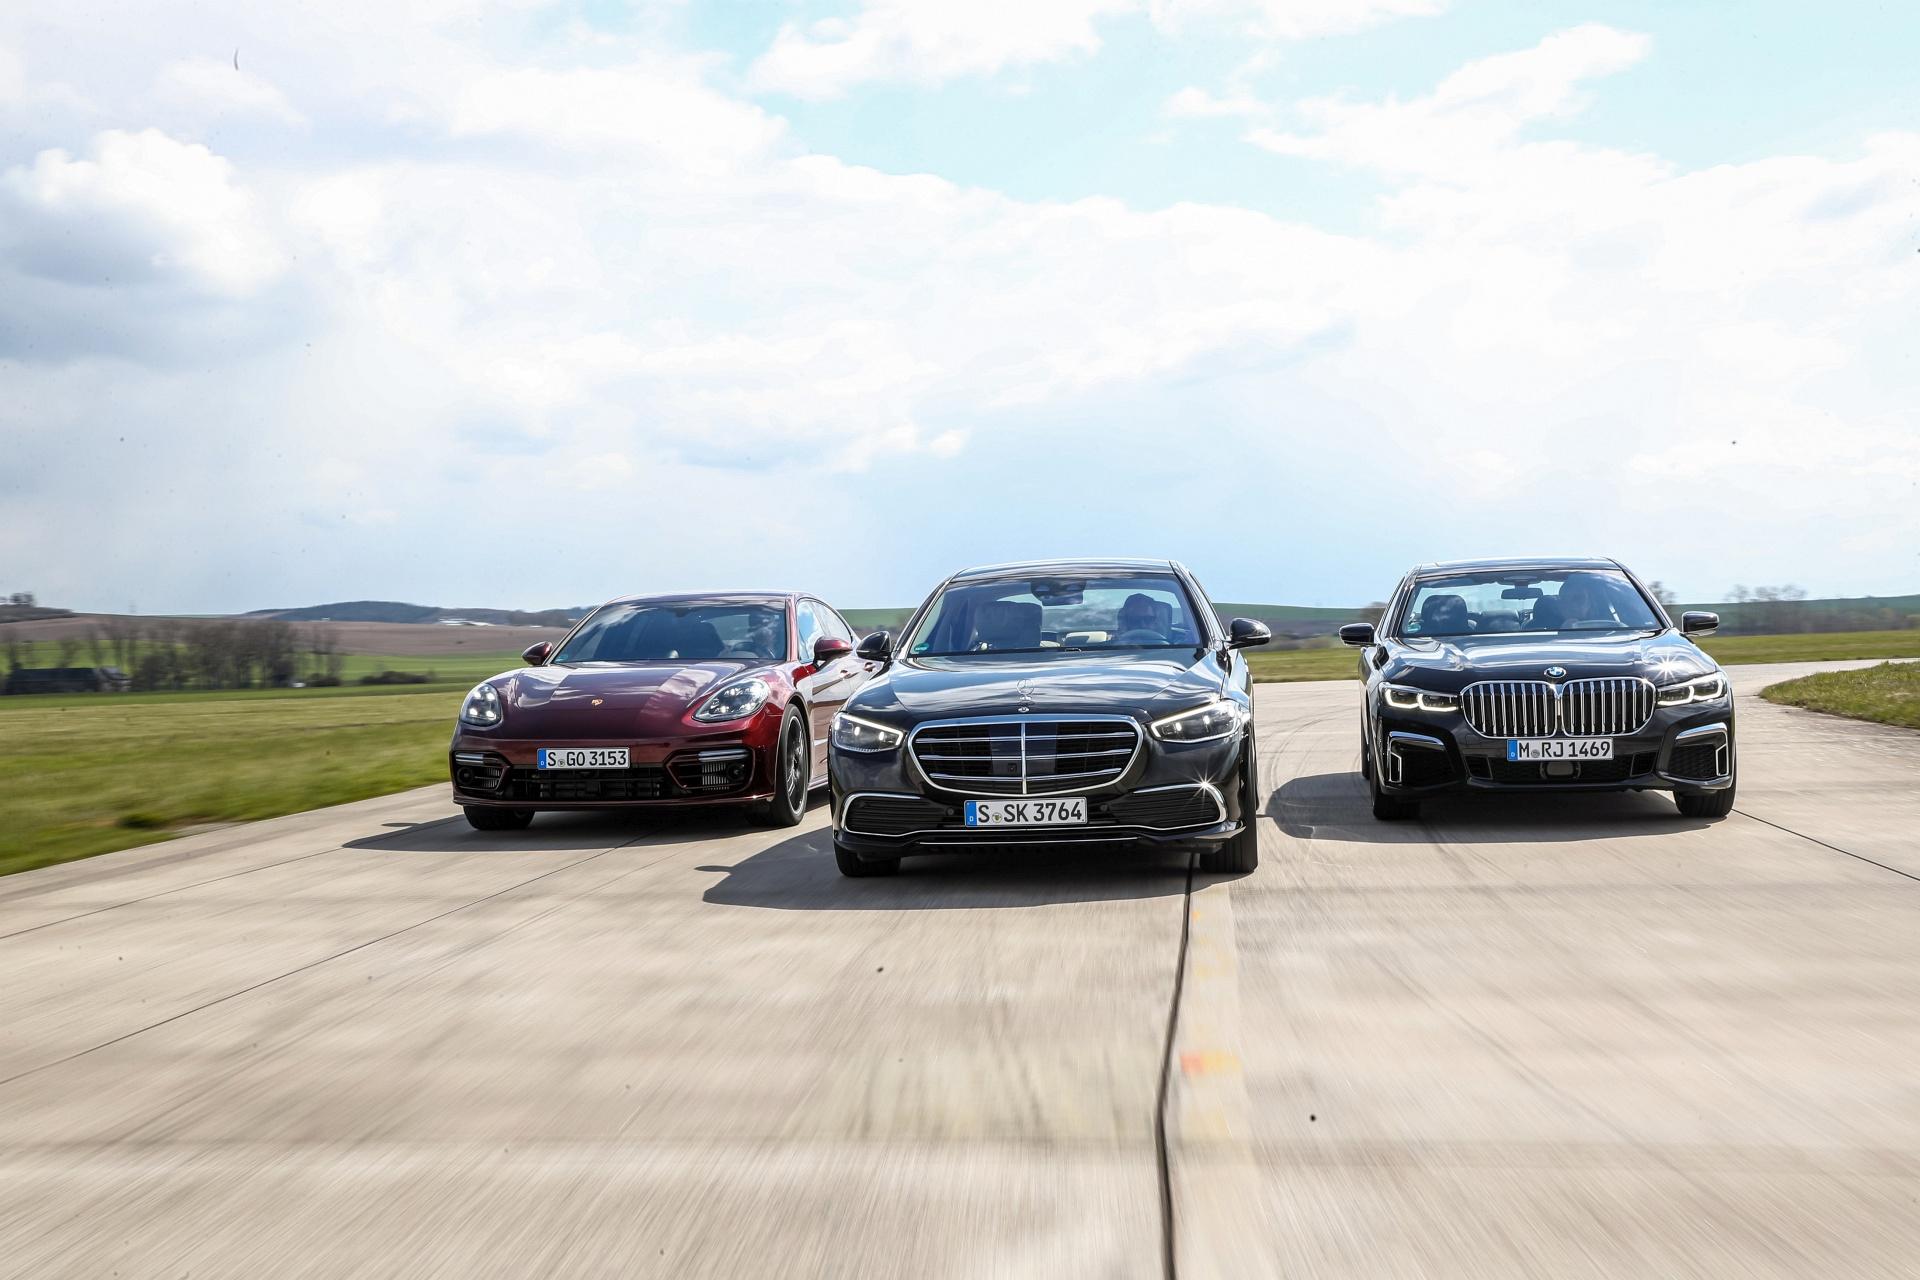 BMW 750i, Mercedes S 500, Porsche Panamera 4S - przody